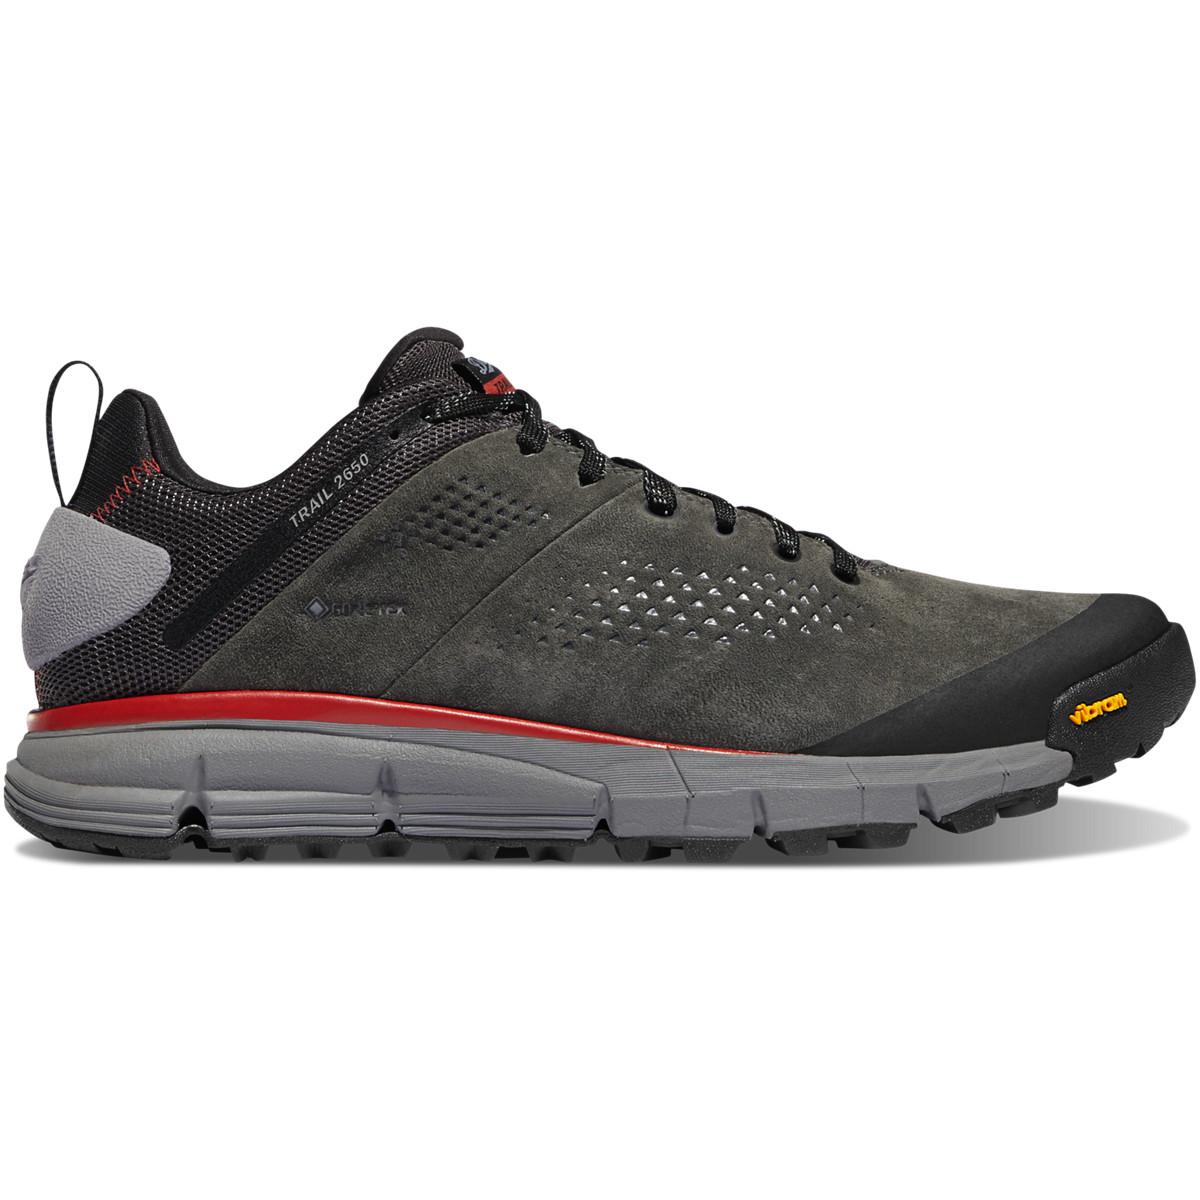 "Trail 2650 3"" Dark Gray/Brick Red GTX"